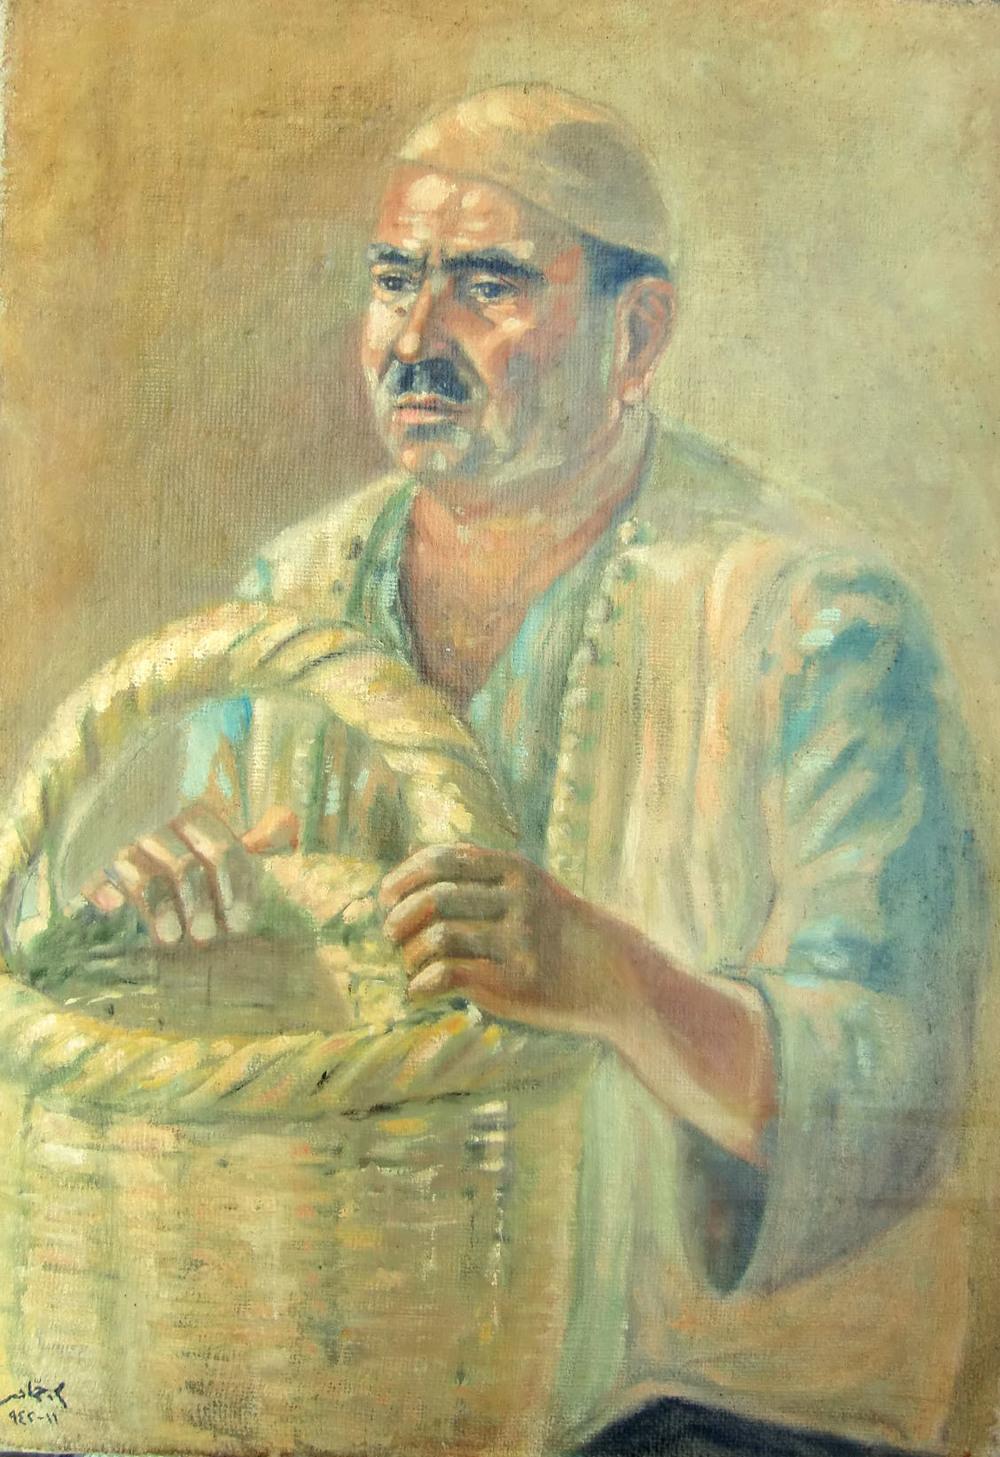 Man With Basket . 11 - 1942 . رجل مع سلة